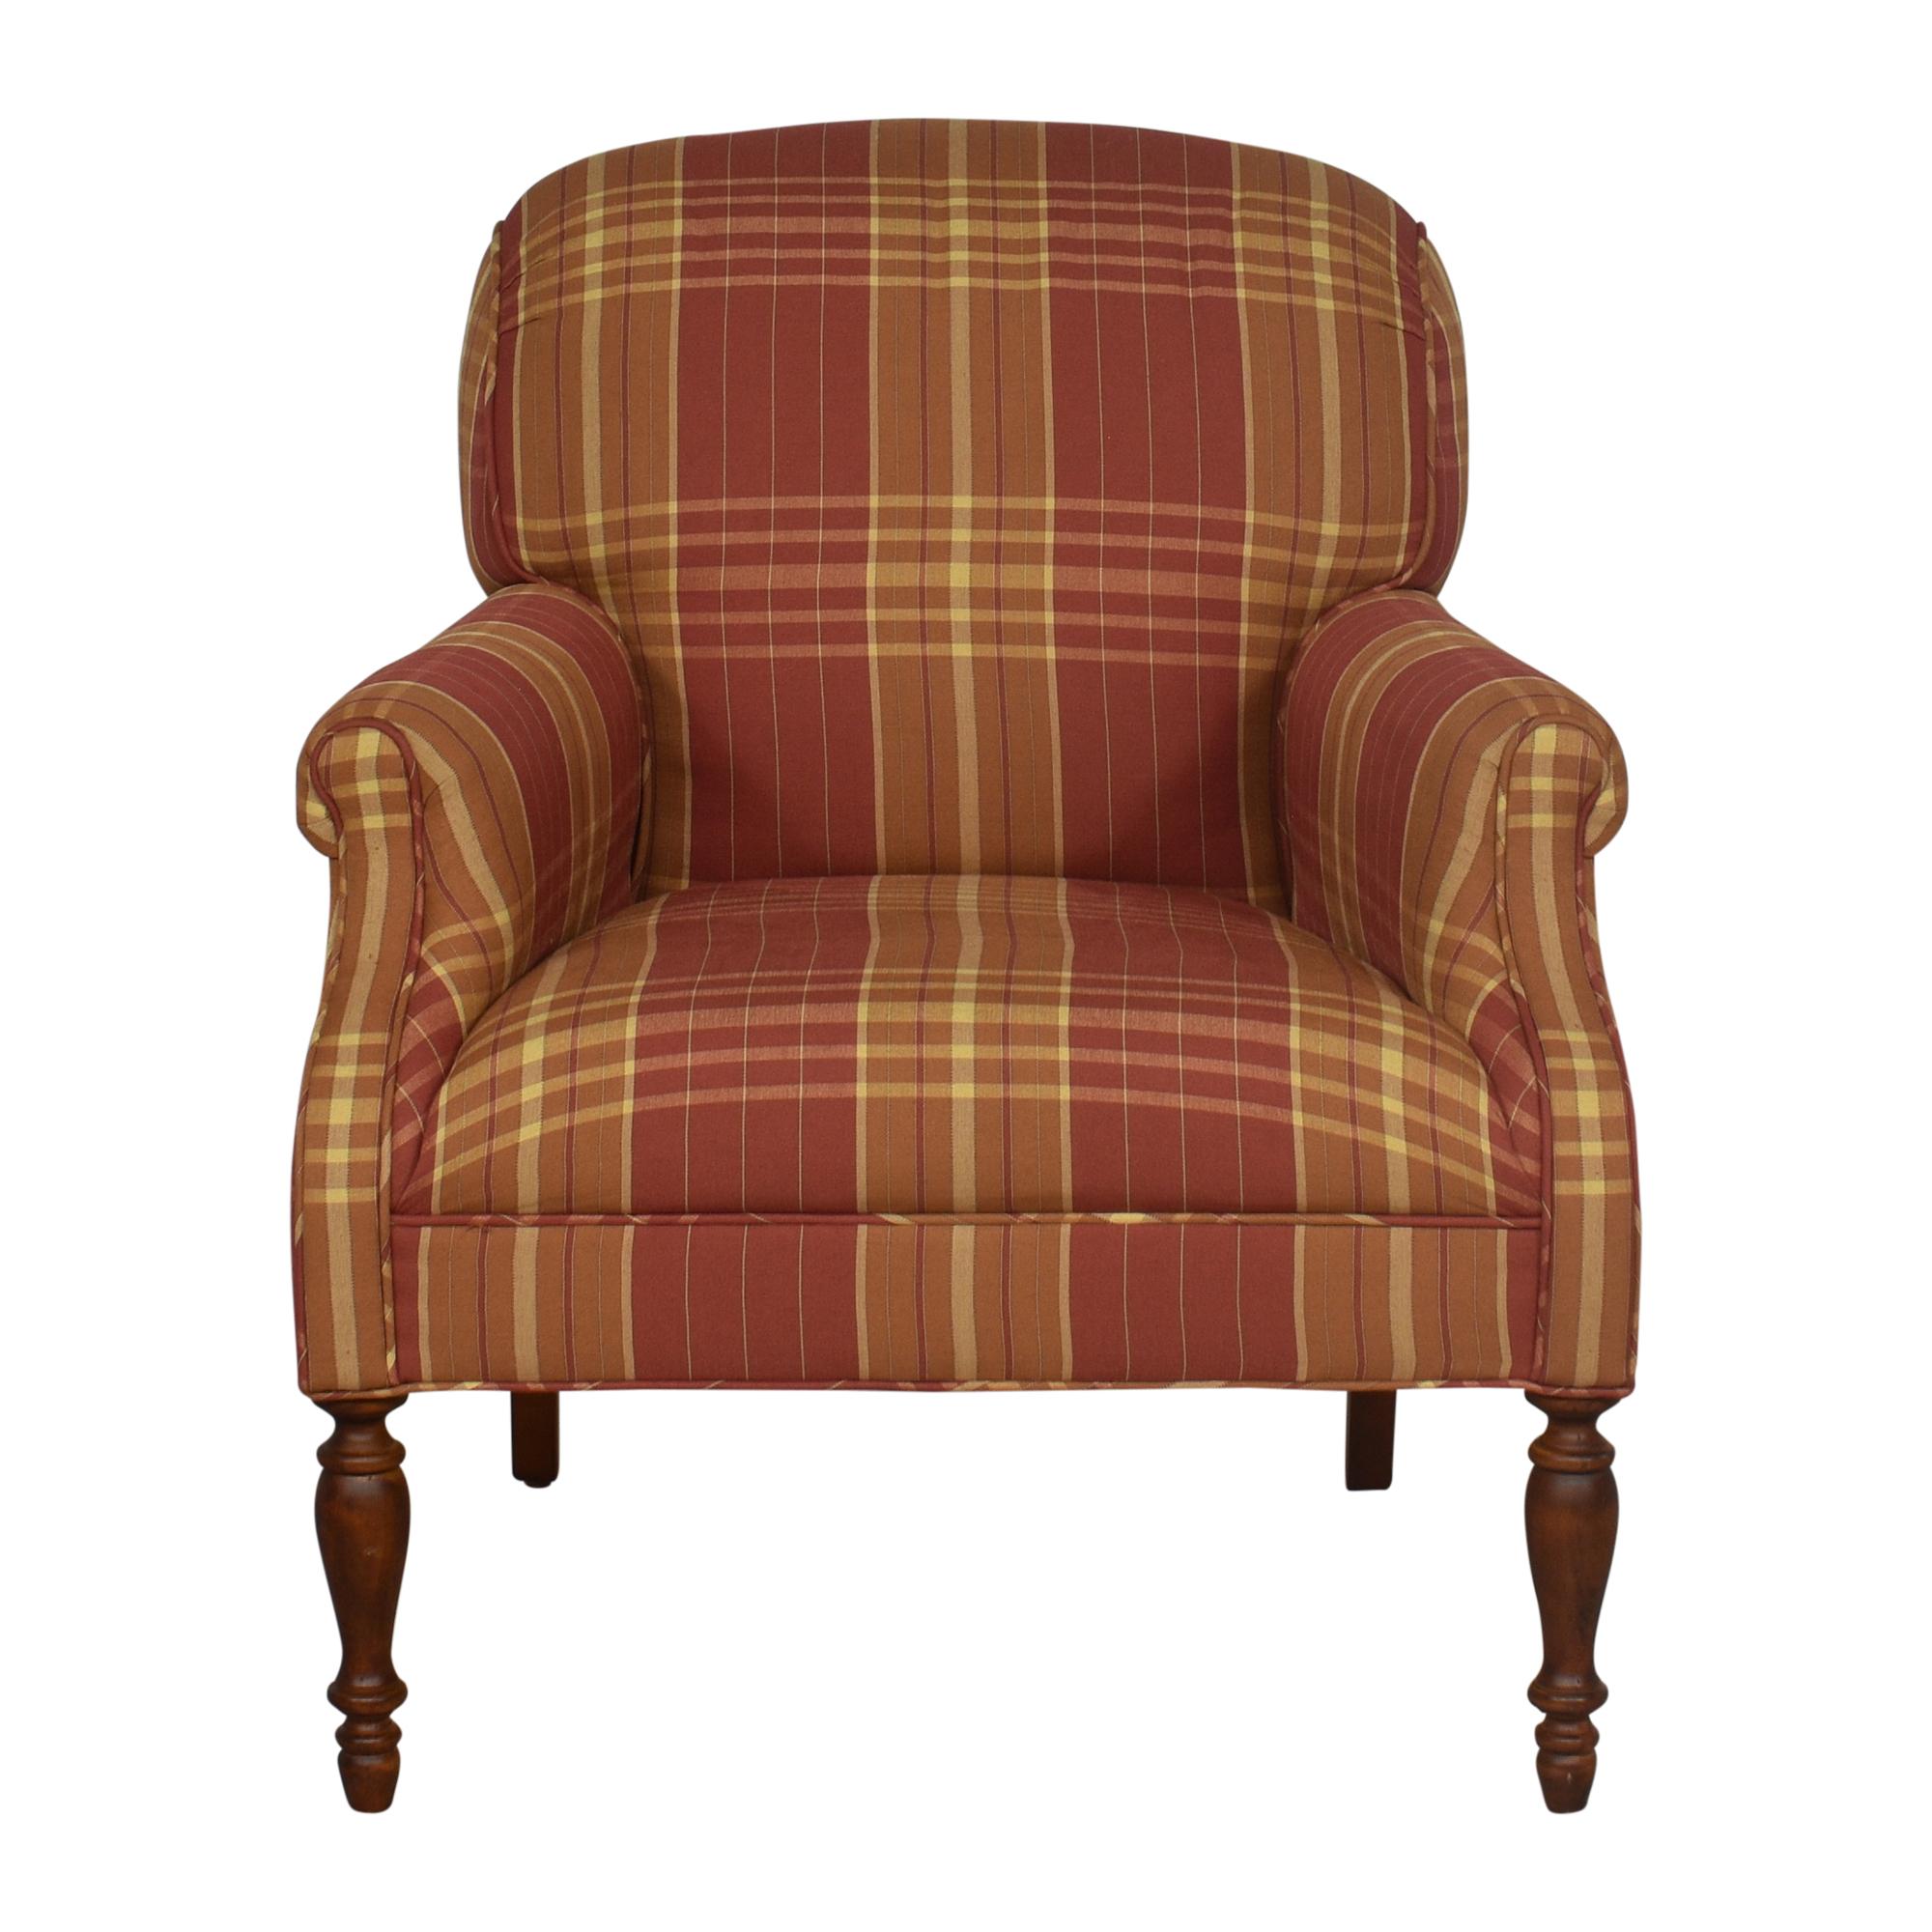 Lee Jofa Vivien Chair / Accent Chairs